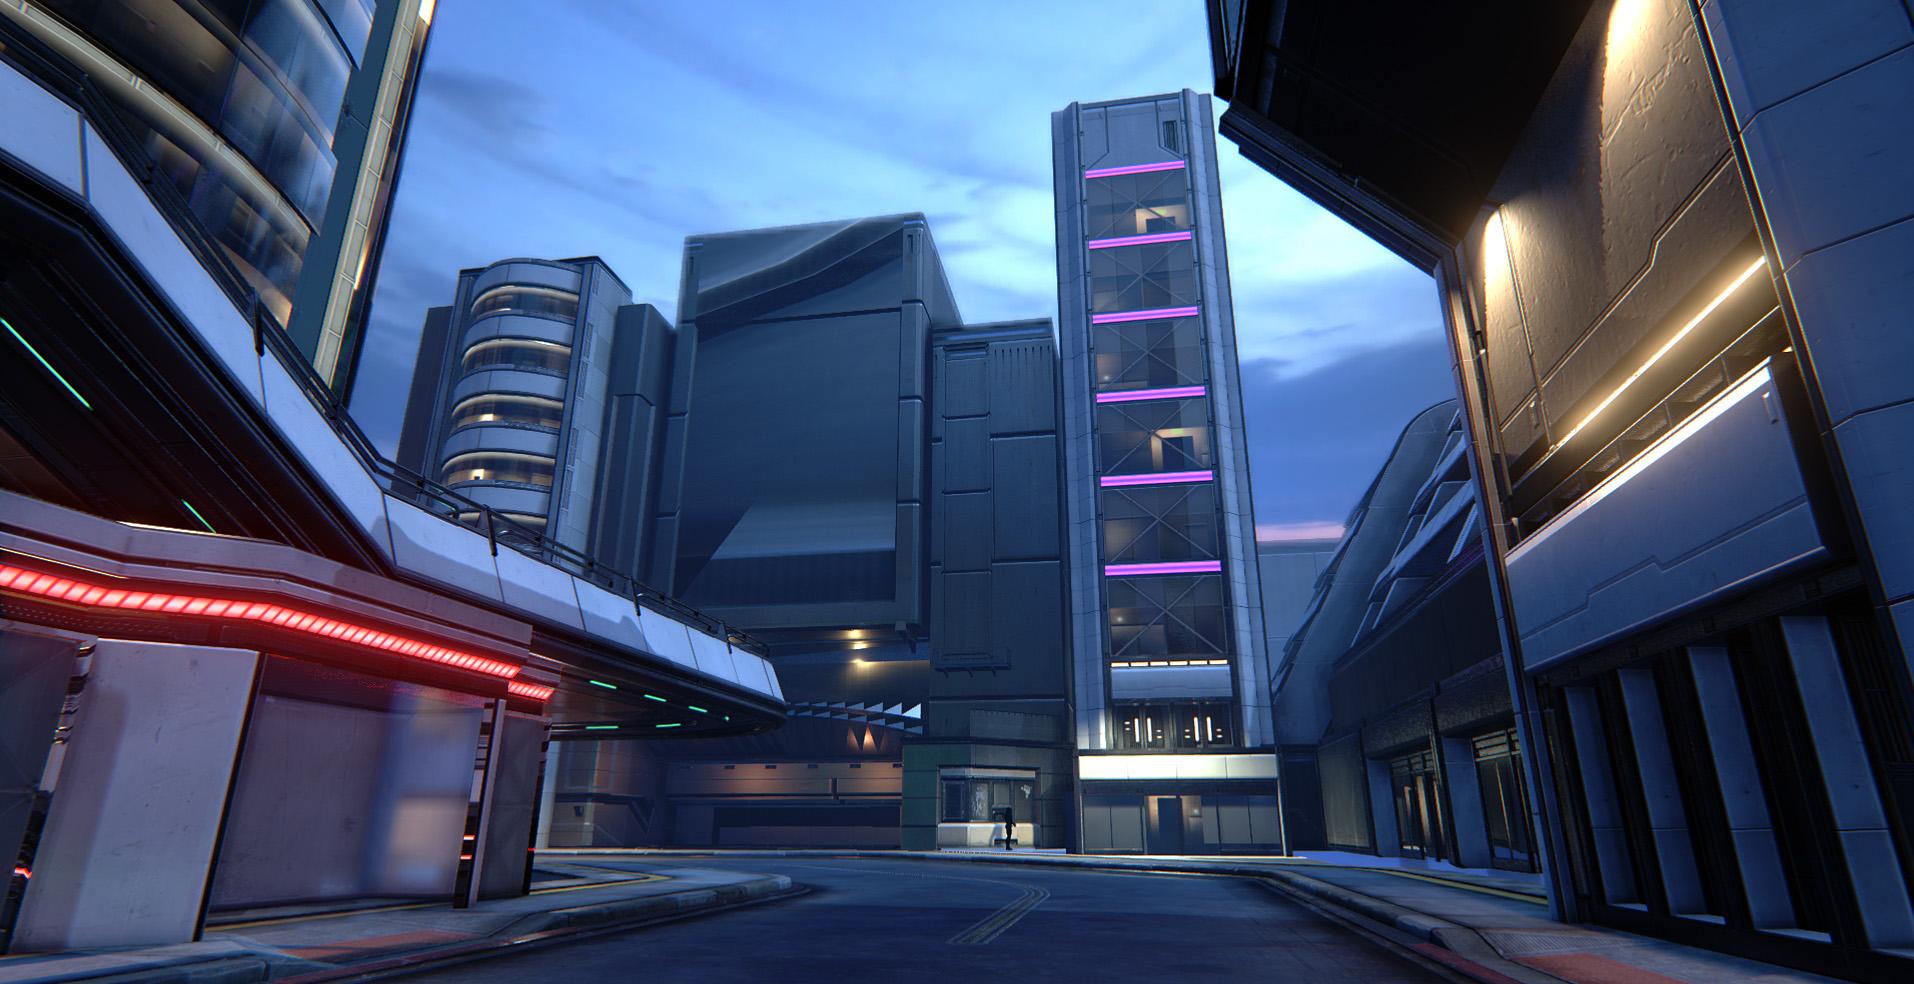 [UE4] SAMPA - A near-future sci-fi city — polycount